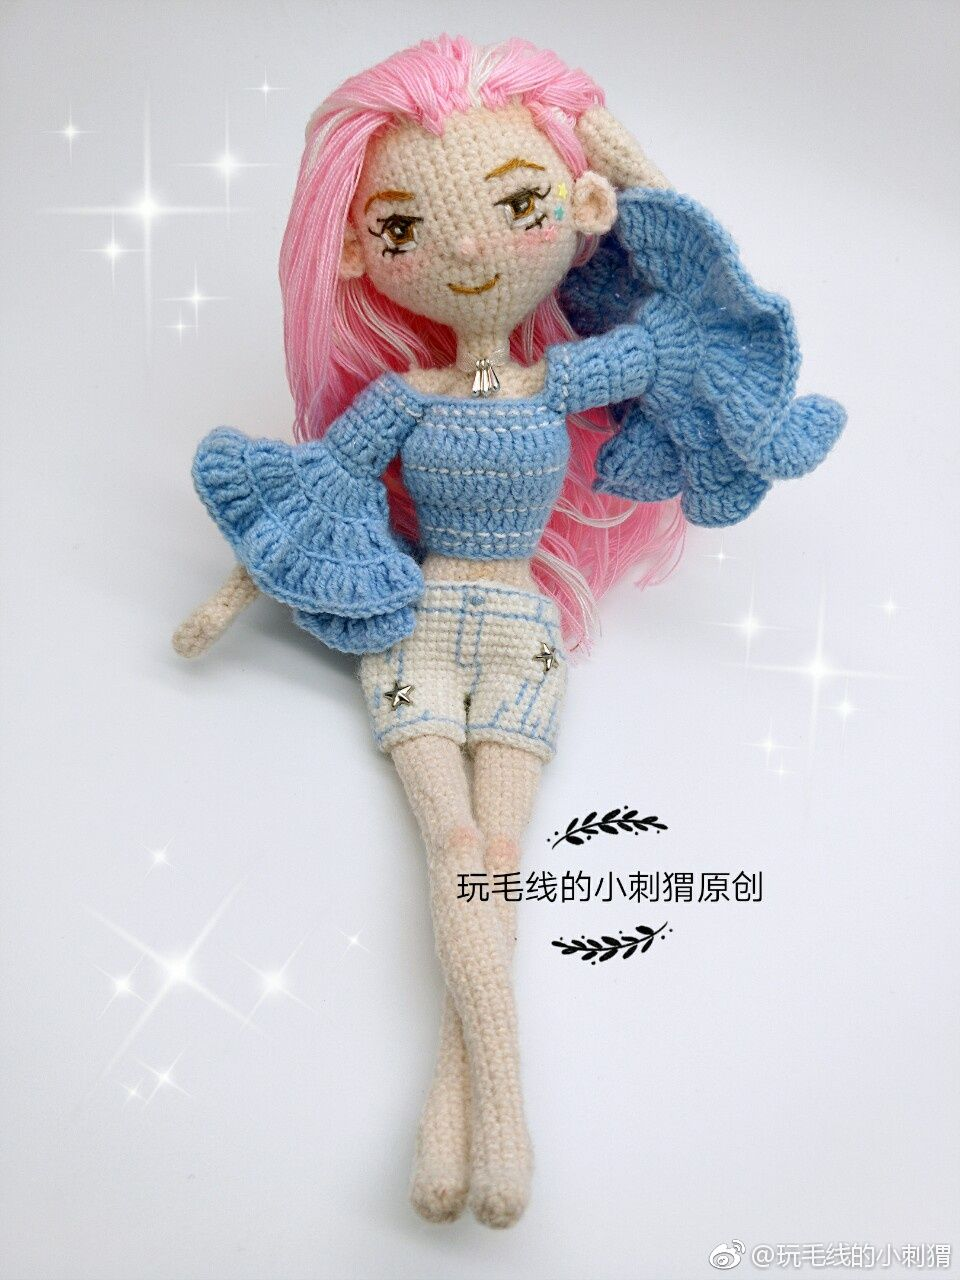 Pin by Apple yang on Weibo微博 | Crochet doll, Crochet dolls ... | 1280x960